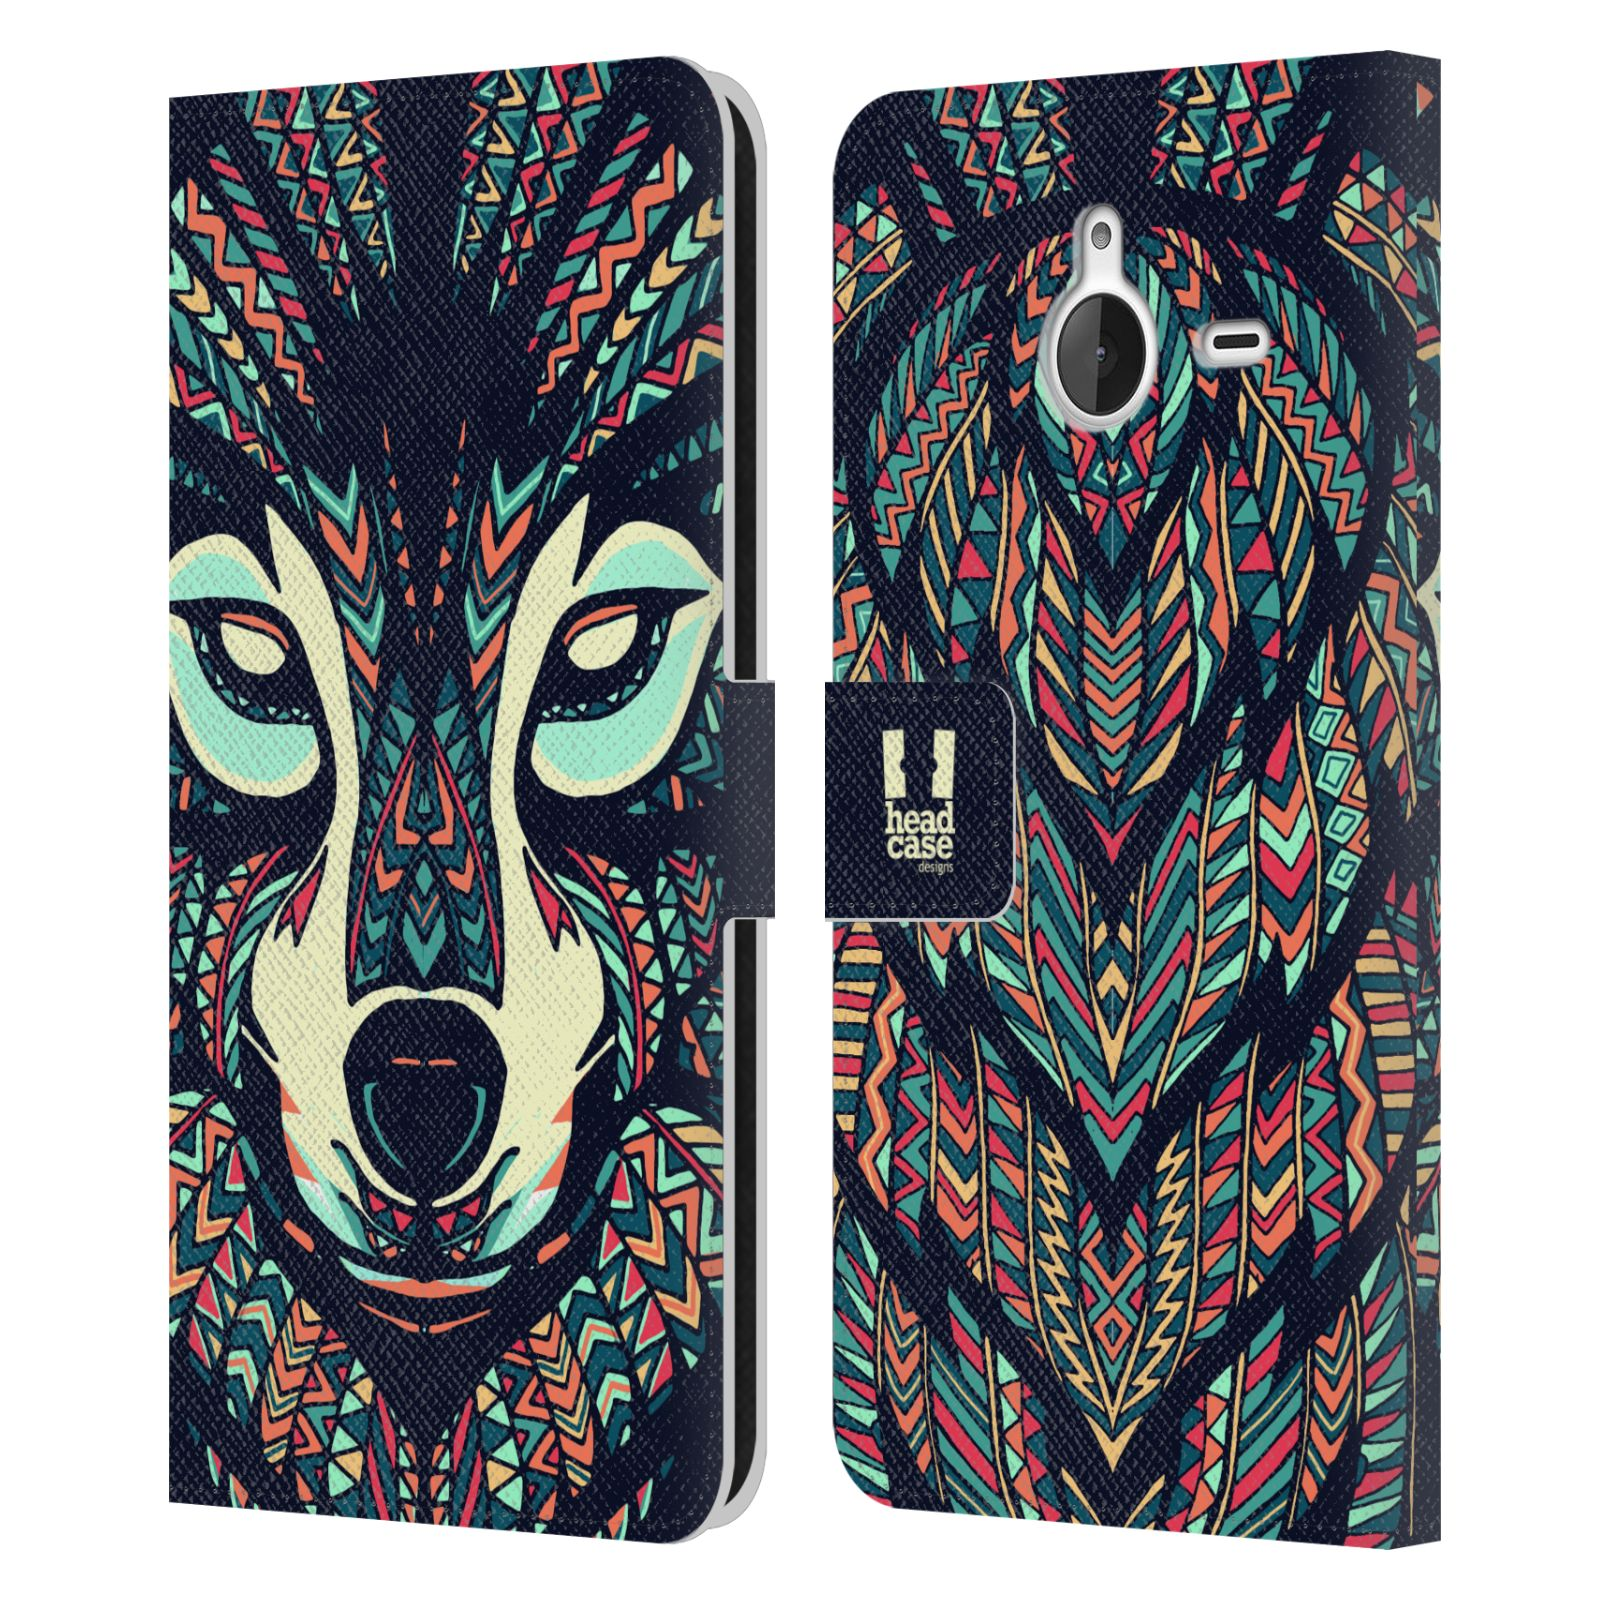 Pouzdro na mobil Nokia Lumia 640 XL - Head Case - Aztécký vlk